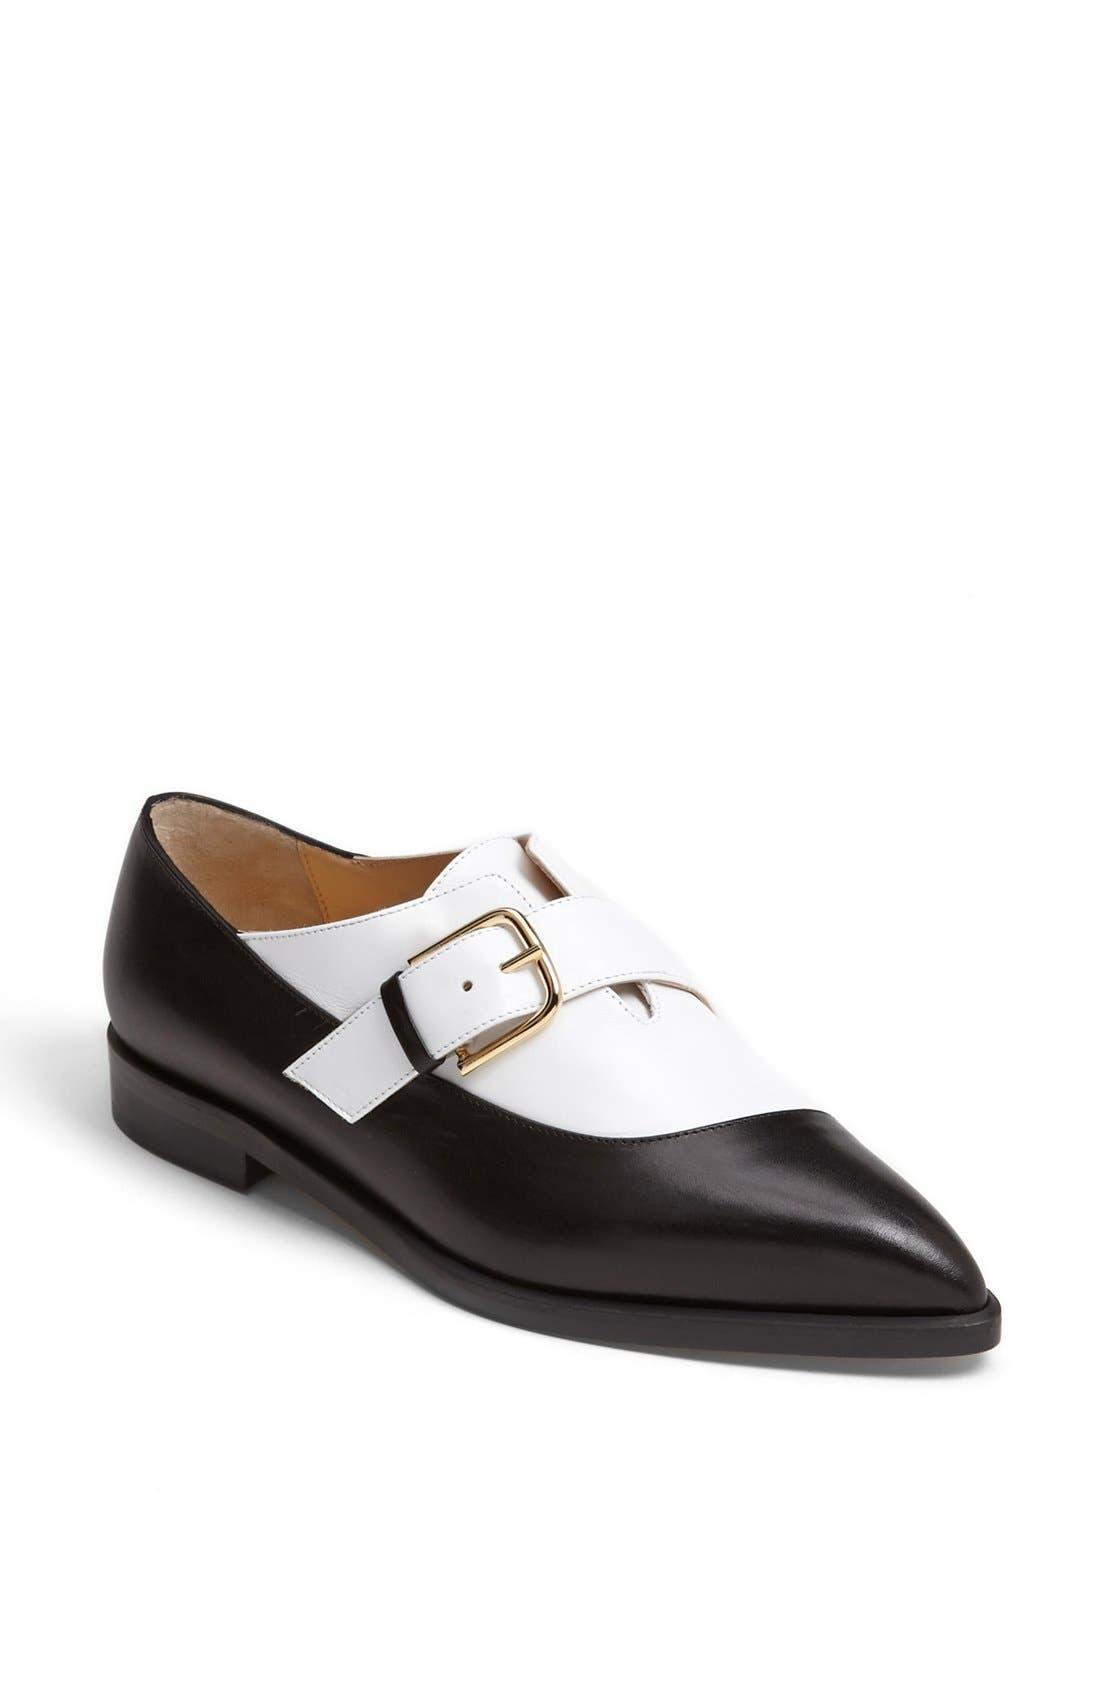 Alternate Image 1 Selected - Bionda Castana 'Norma' Brogue Shoe